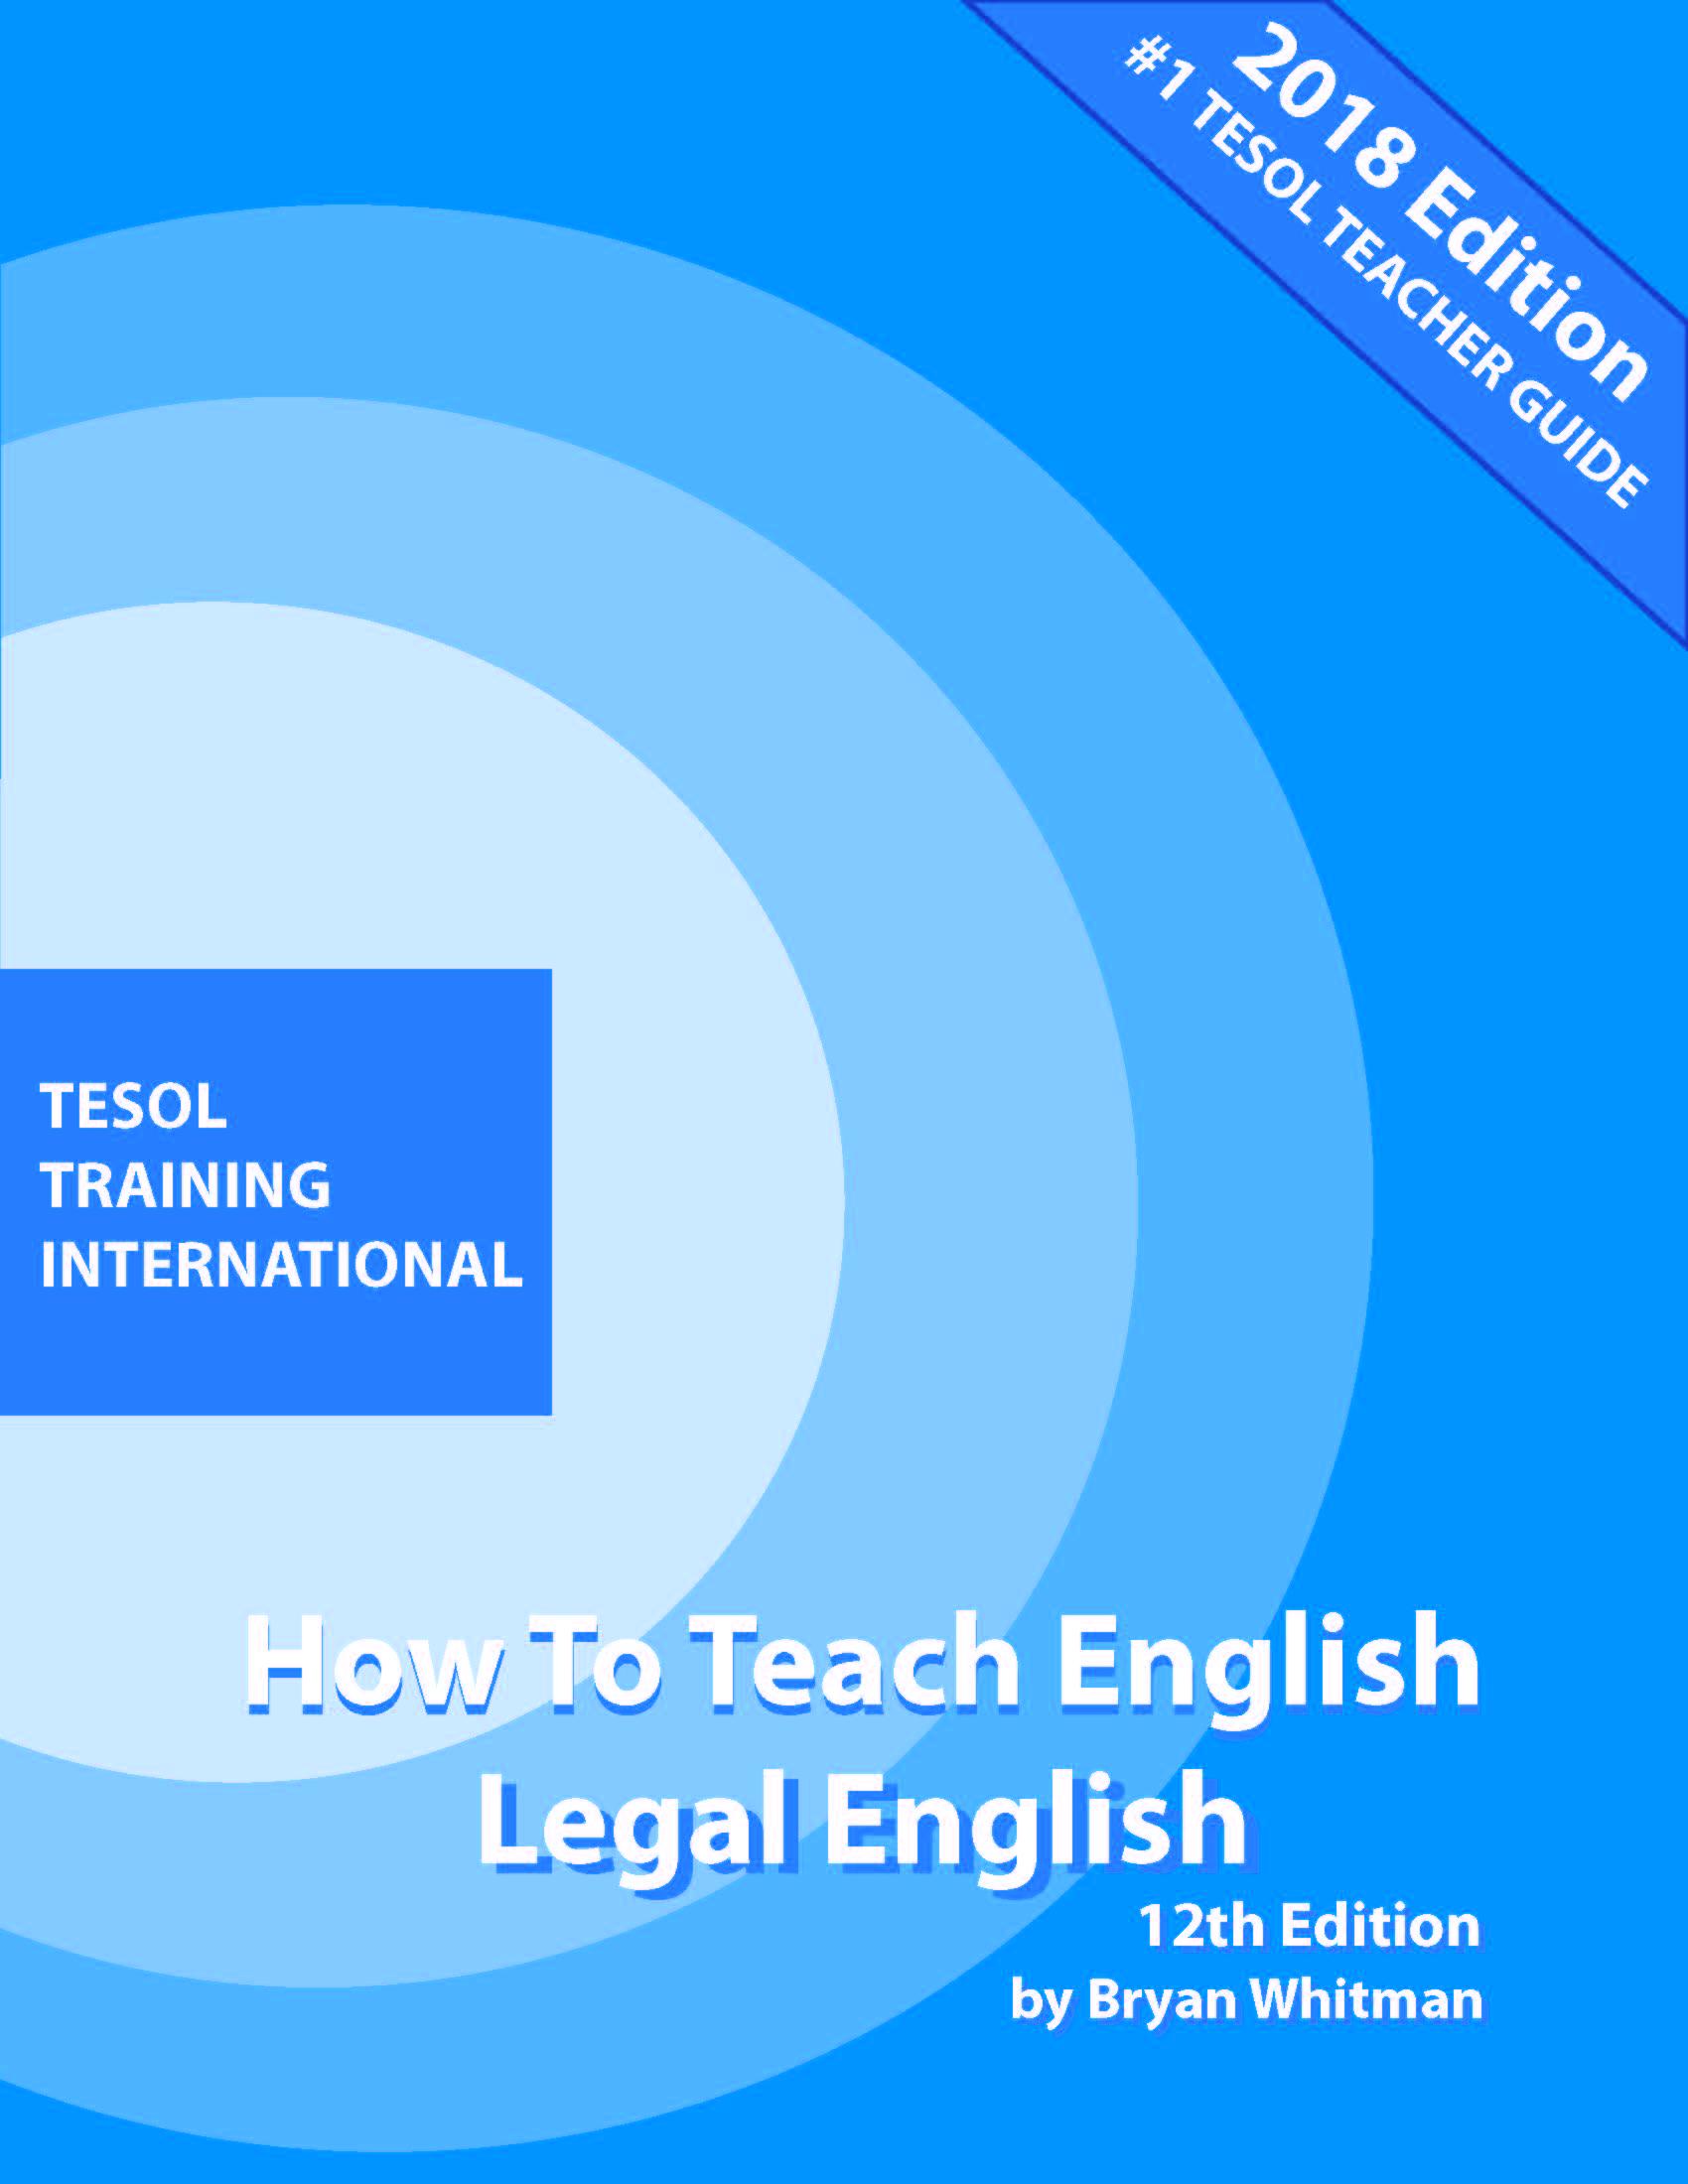 Teaching Legal English